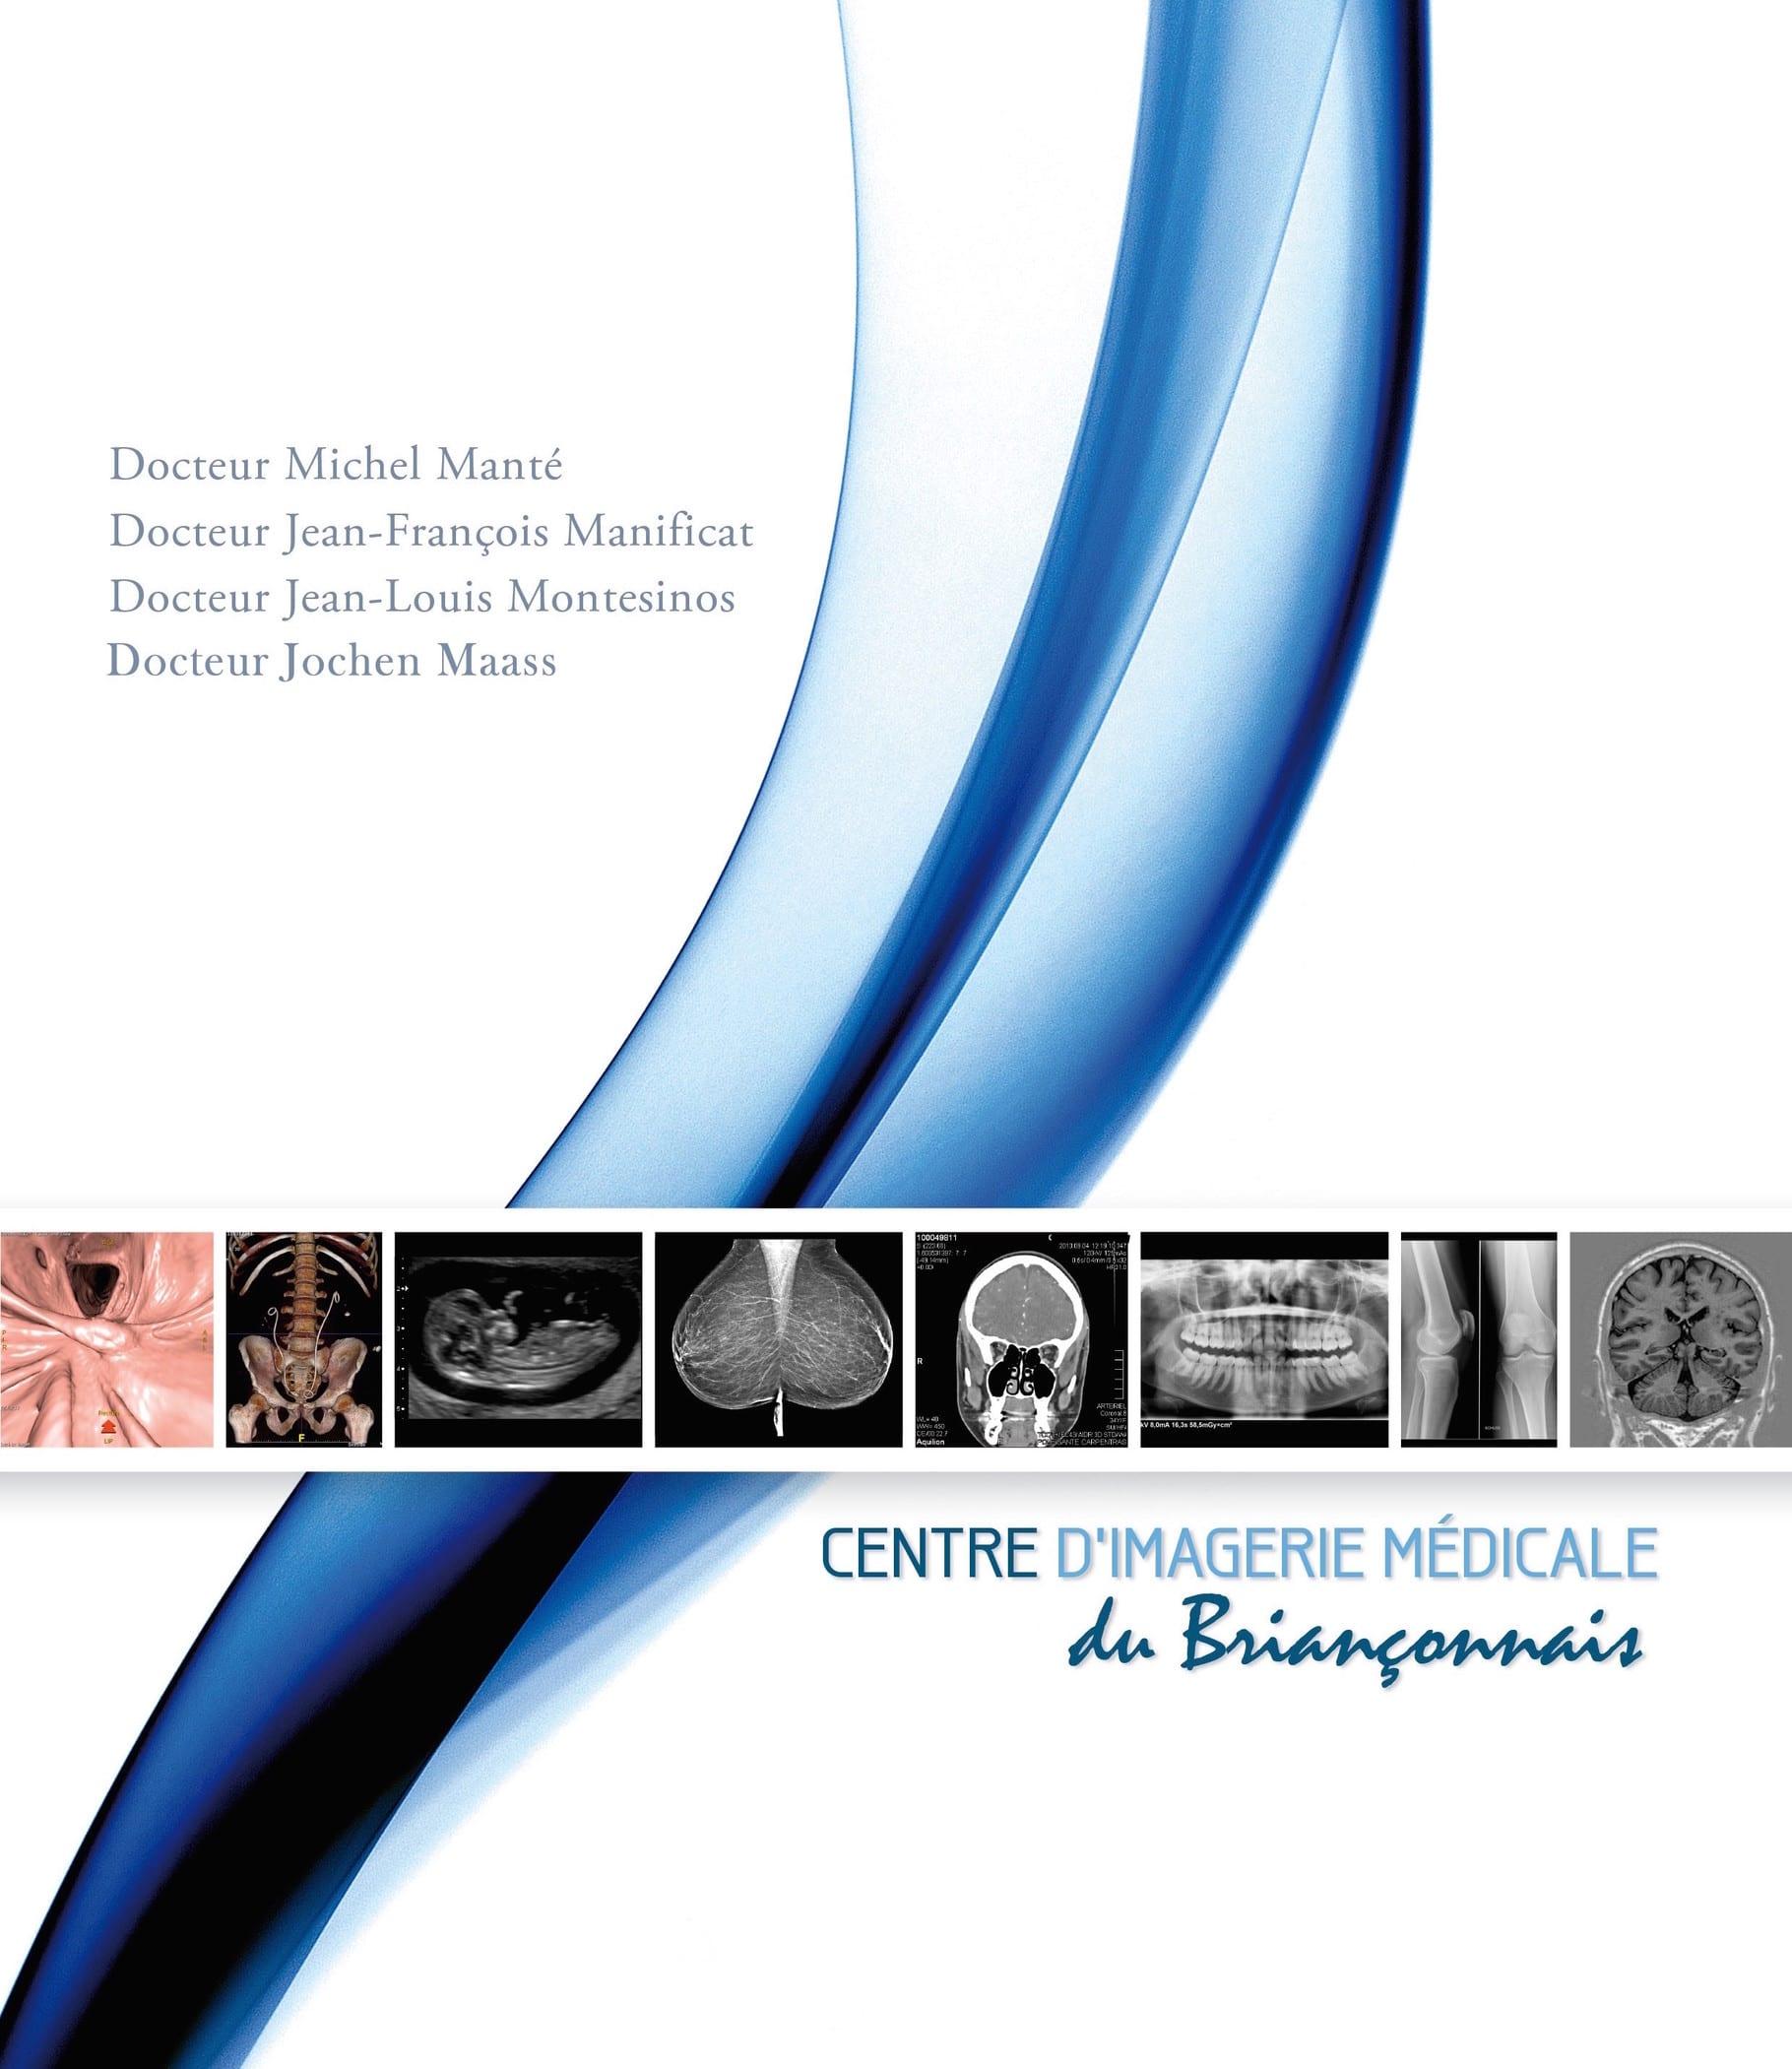 Centre d'Imagerie Médicale du ... - Radiologie Briancon - www.radiologie-briancon.fr 1